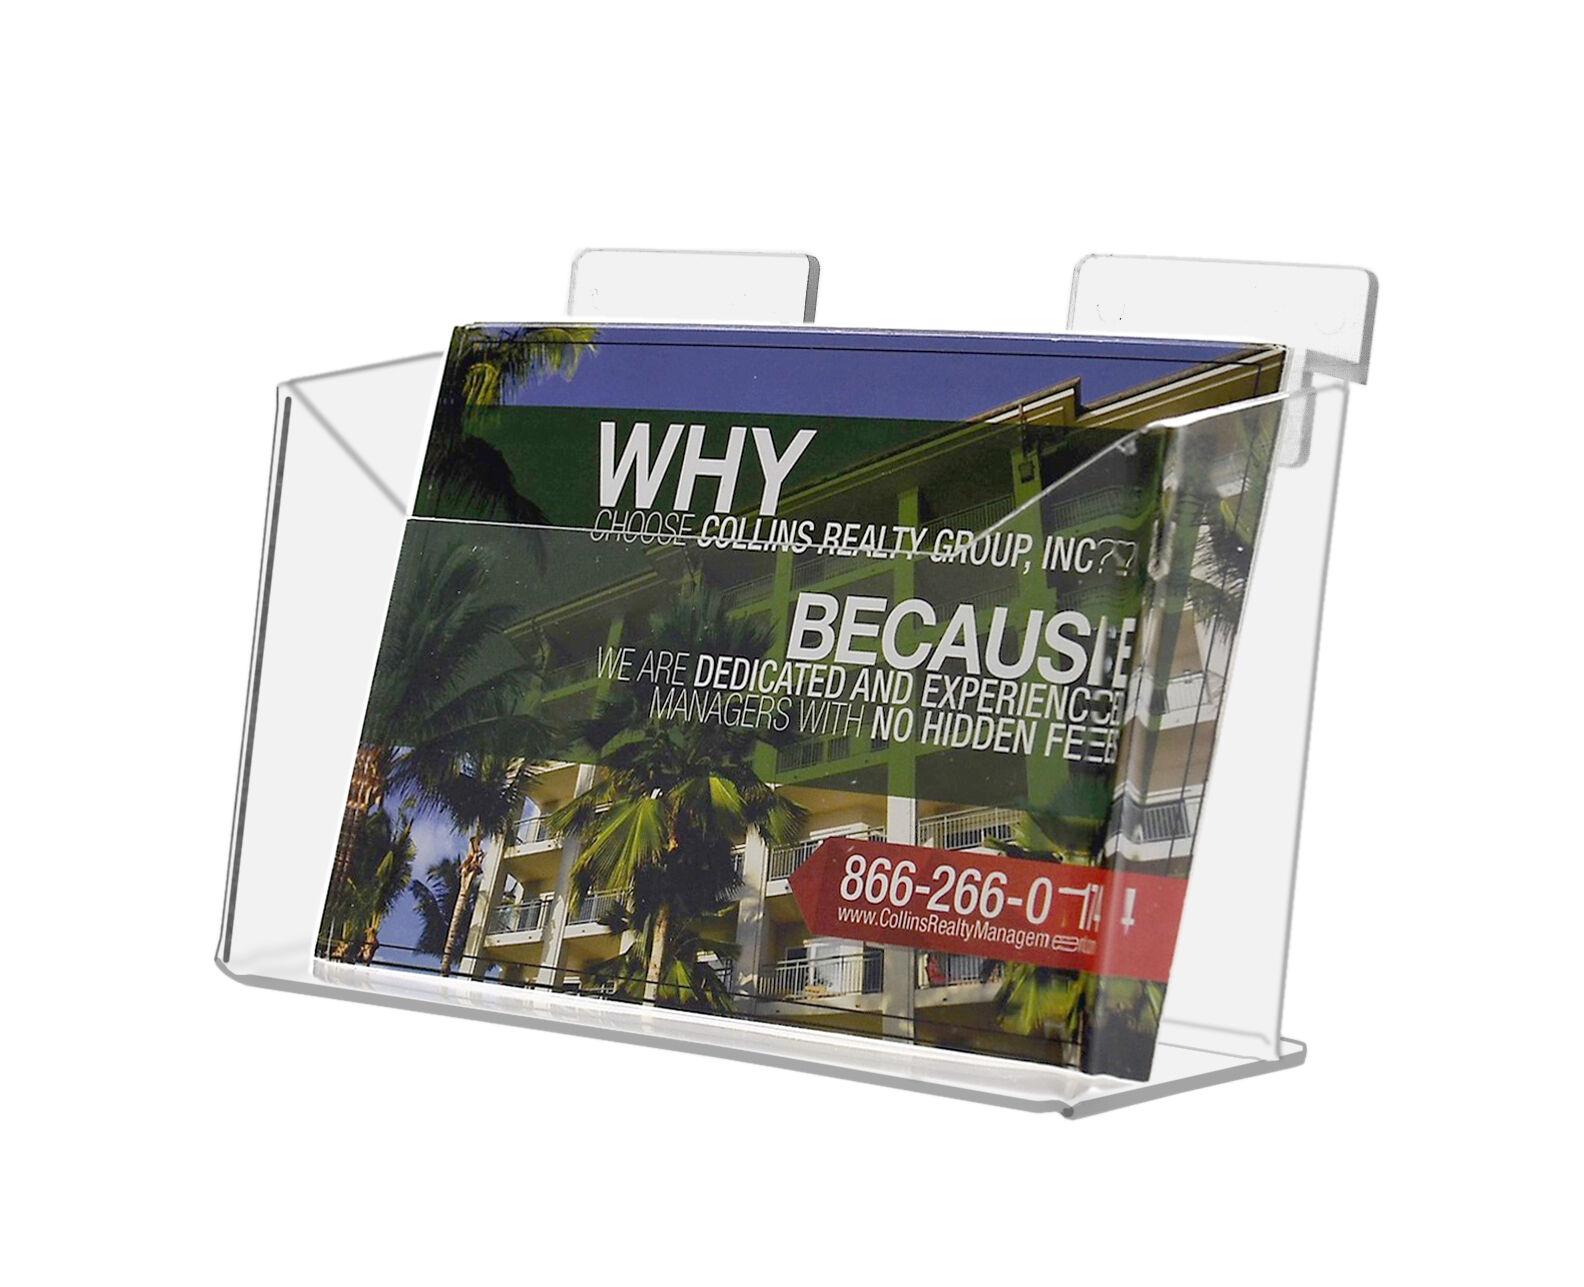 Lot of 6 NEW Clear Acrylic Slatwall Postcard Holder Display Stand Postcard USA